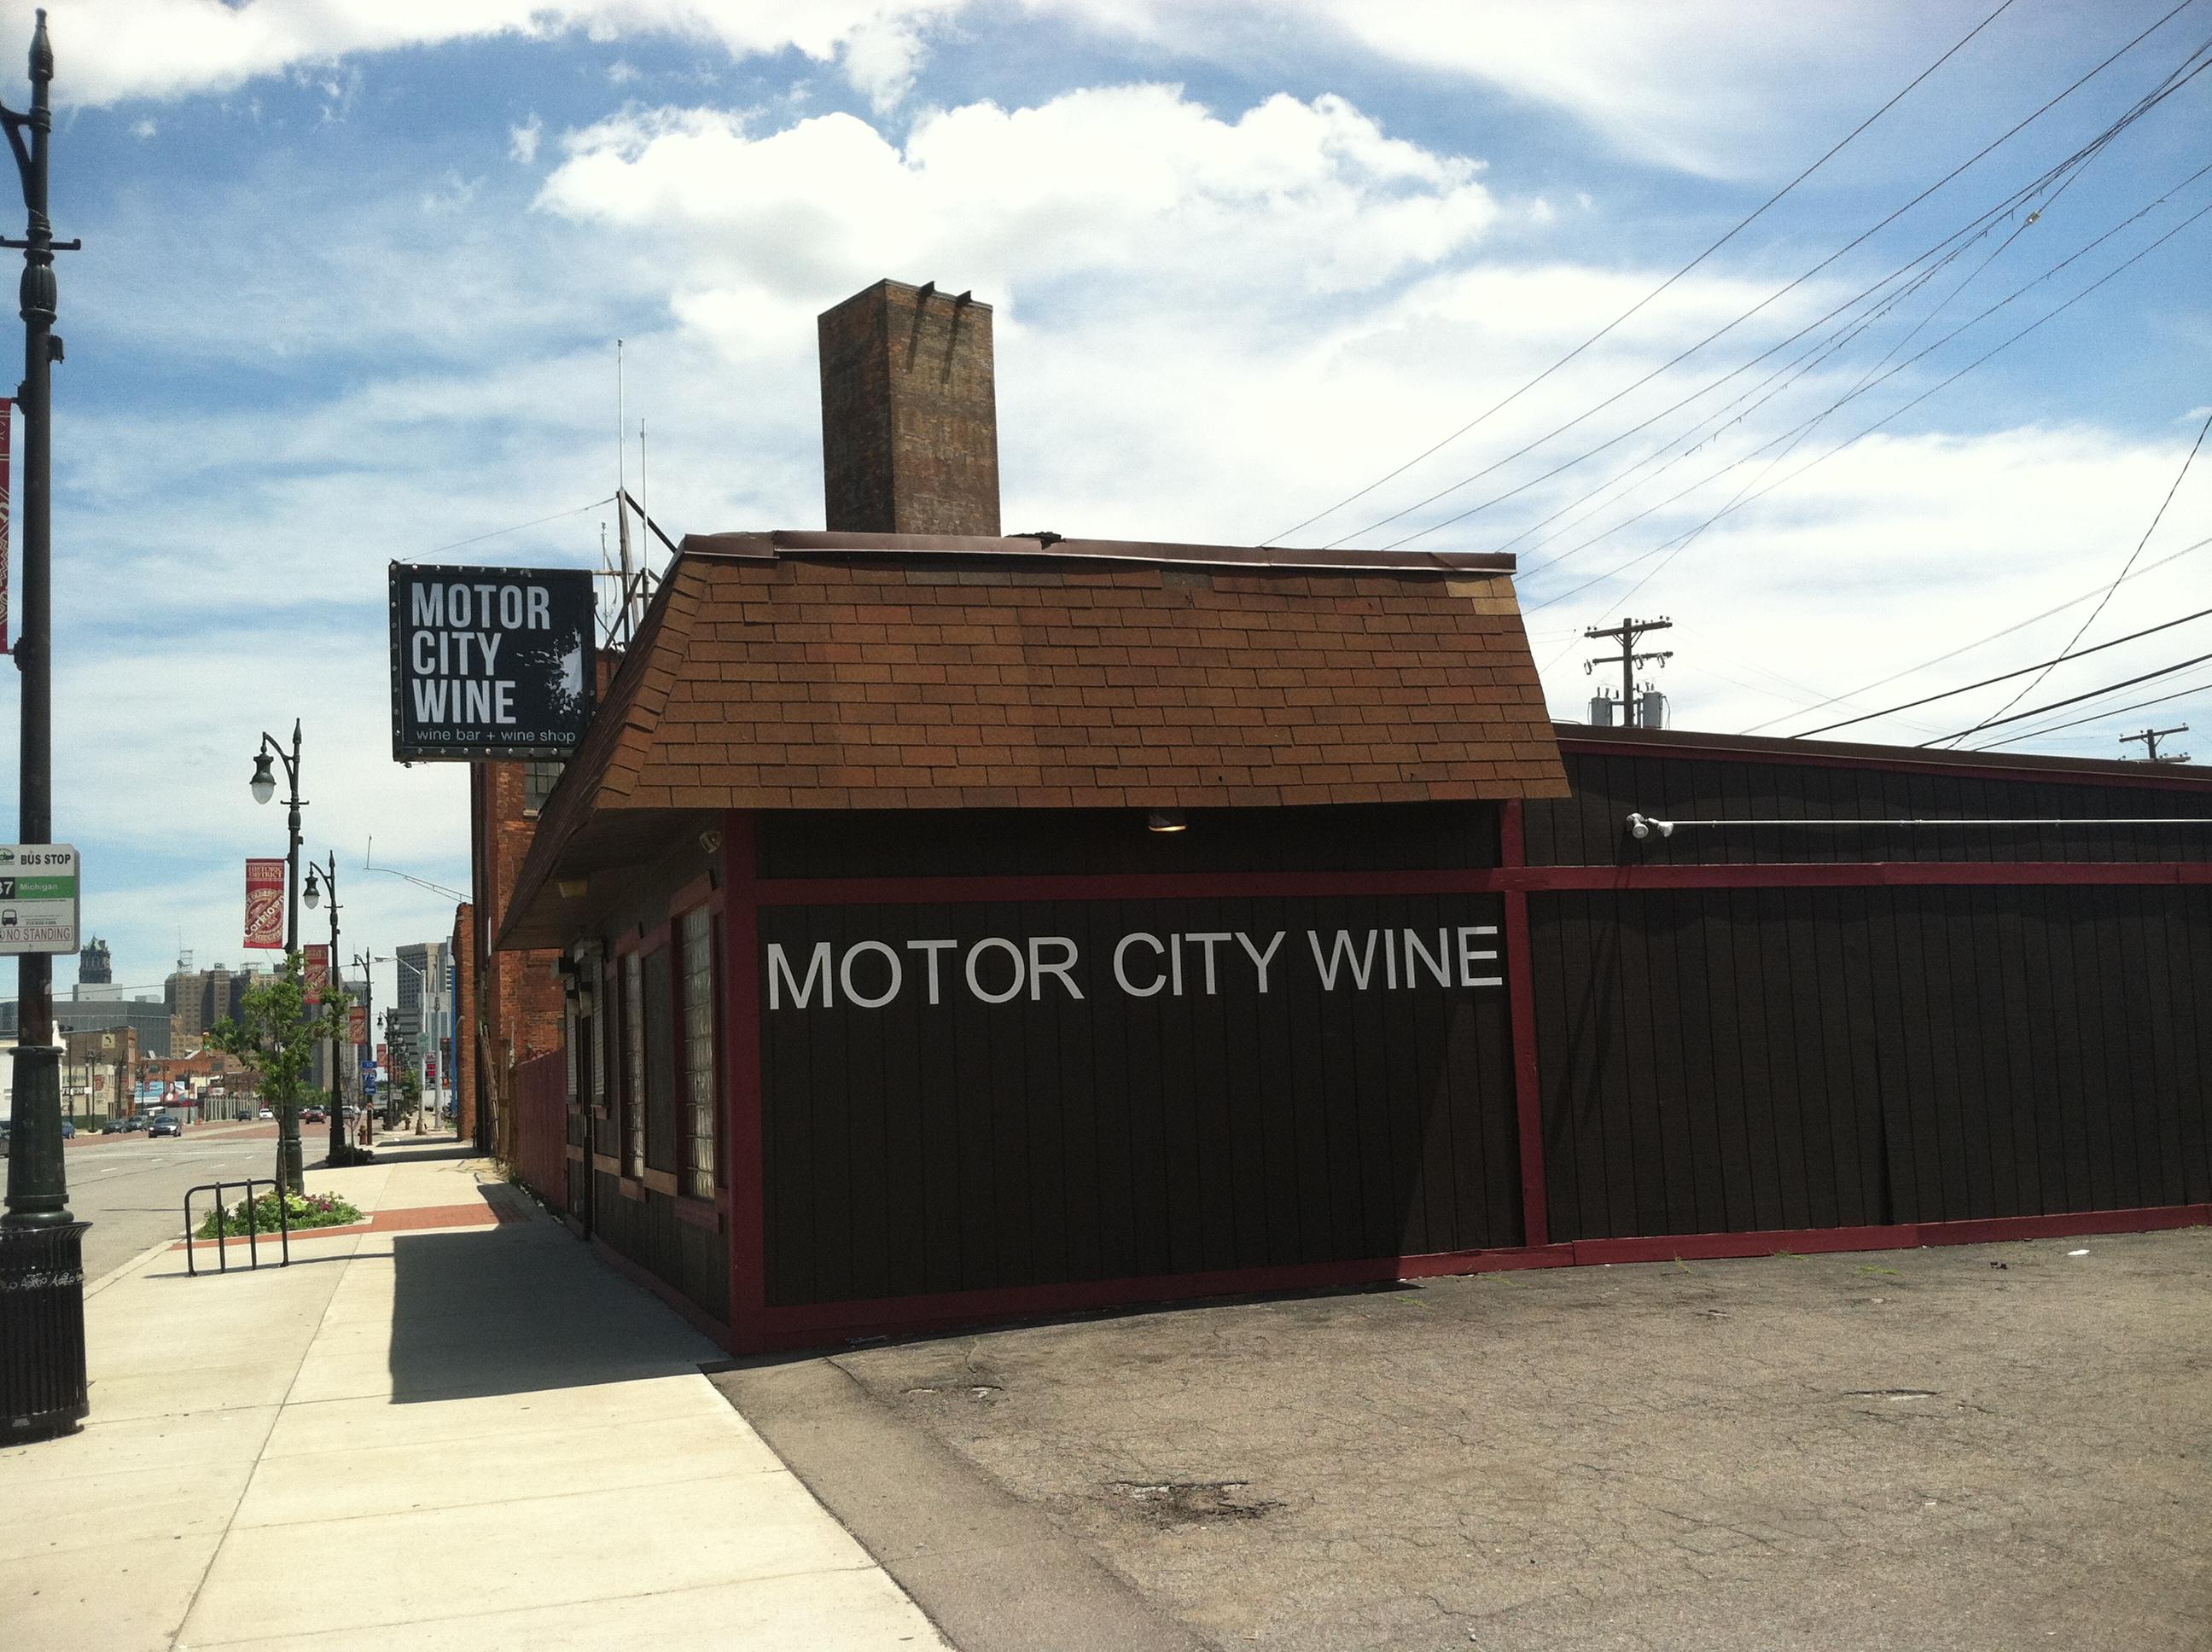 MotorCity Wine.